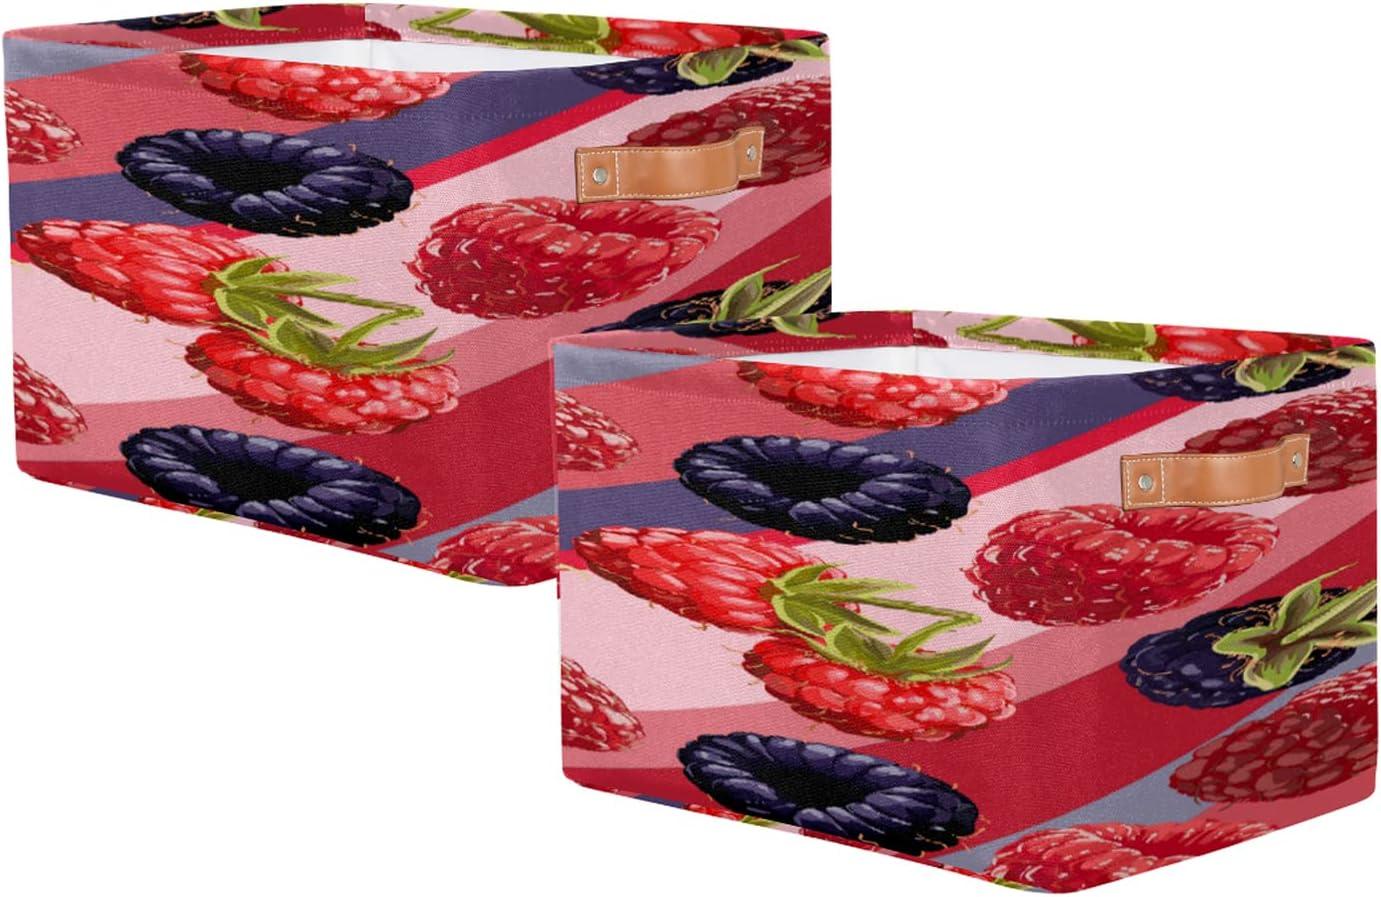 Storage Basket Set of Max 81% OFF 2 Stripe Storag Toy trust Raspberry Rectangular